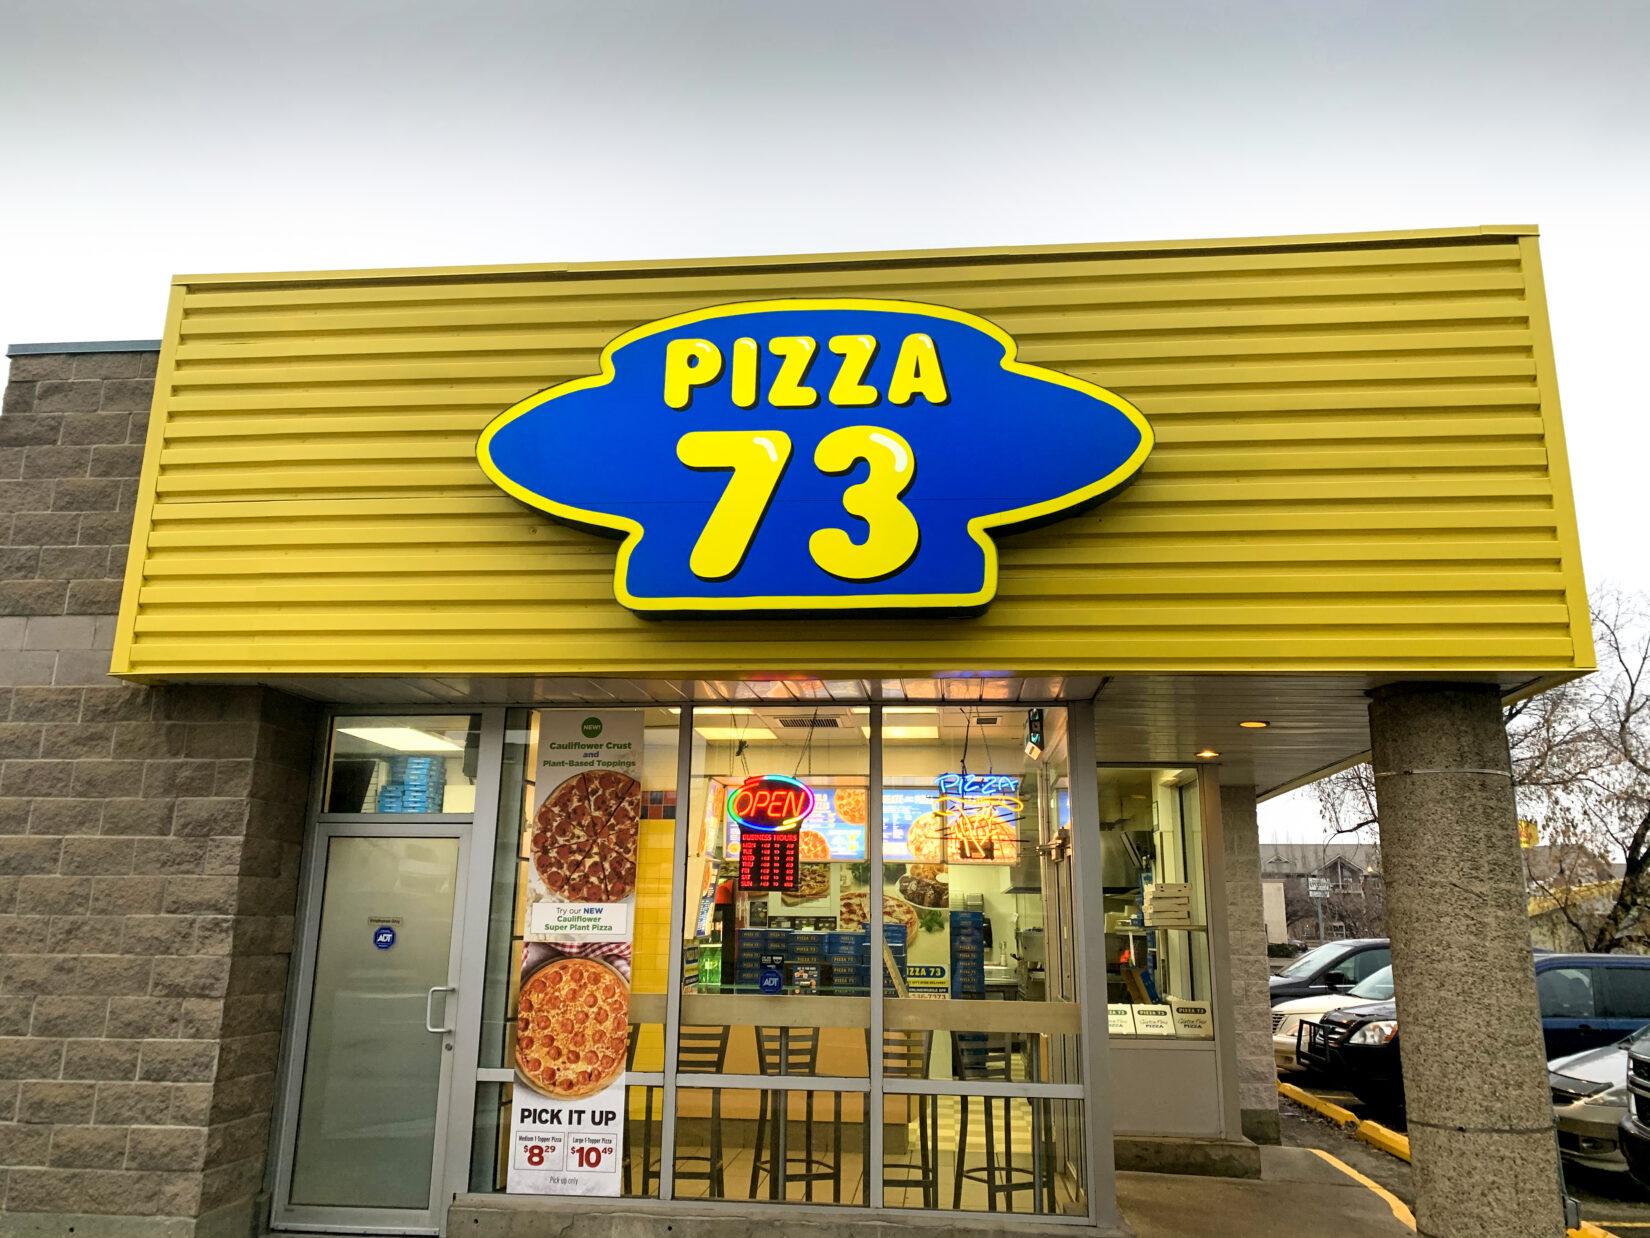 Business Spotlight: Pizza 73